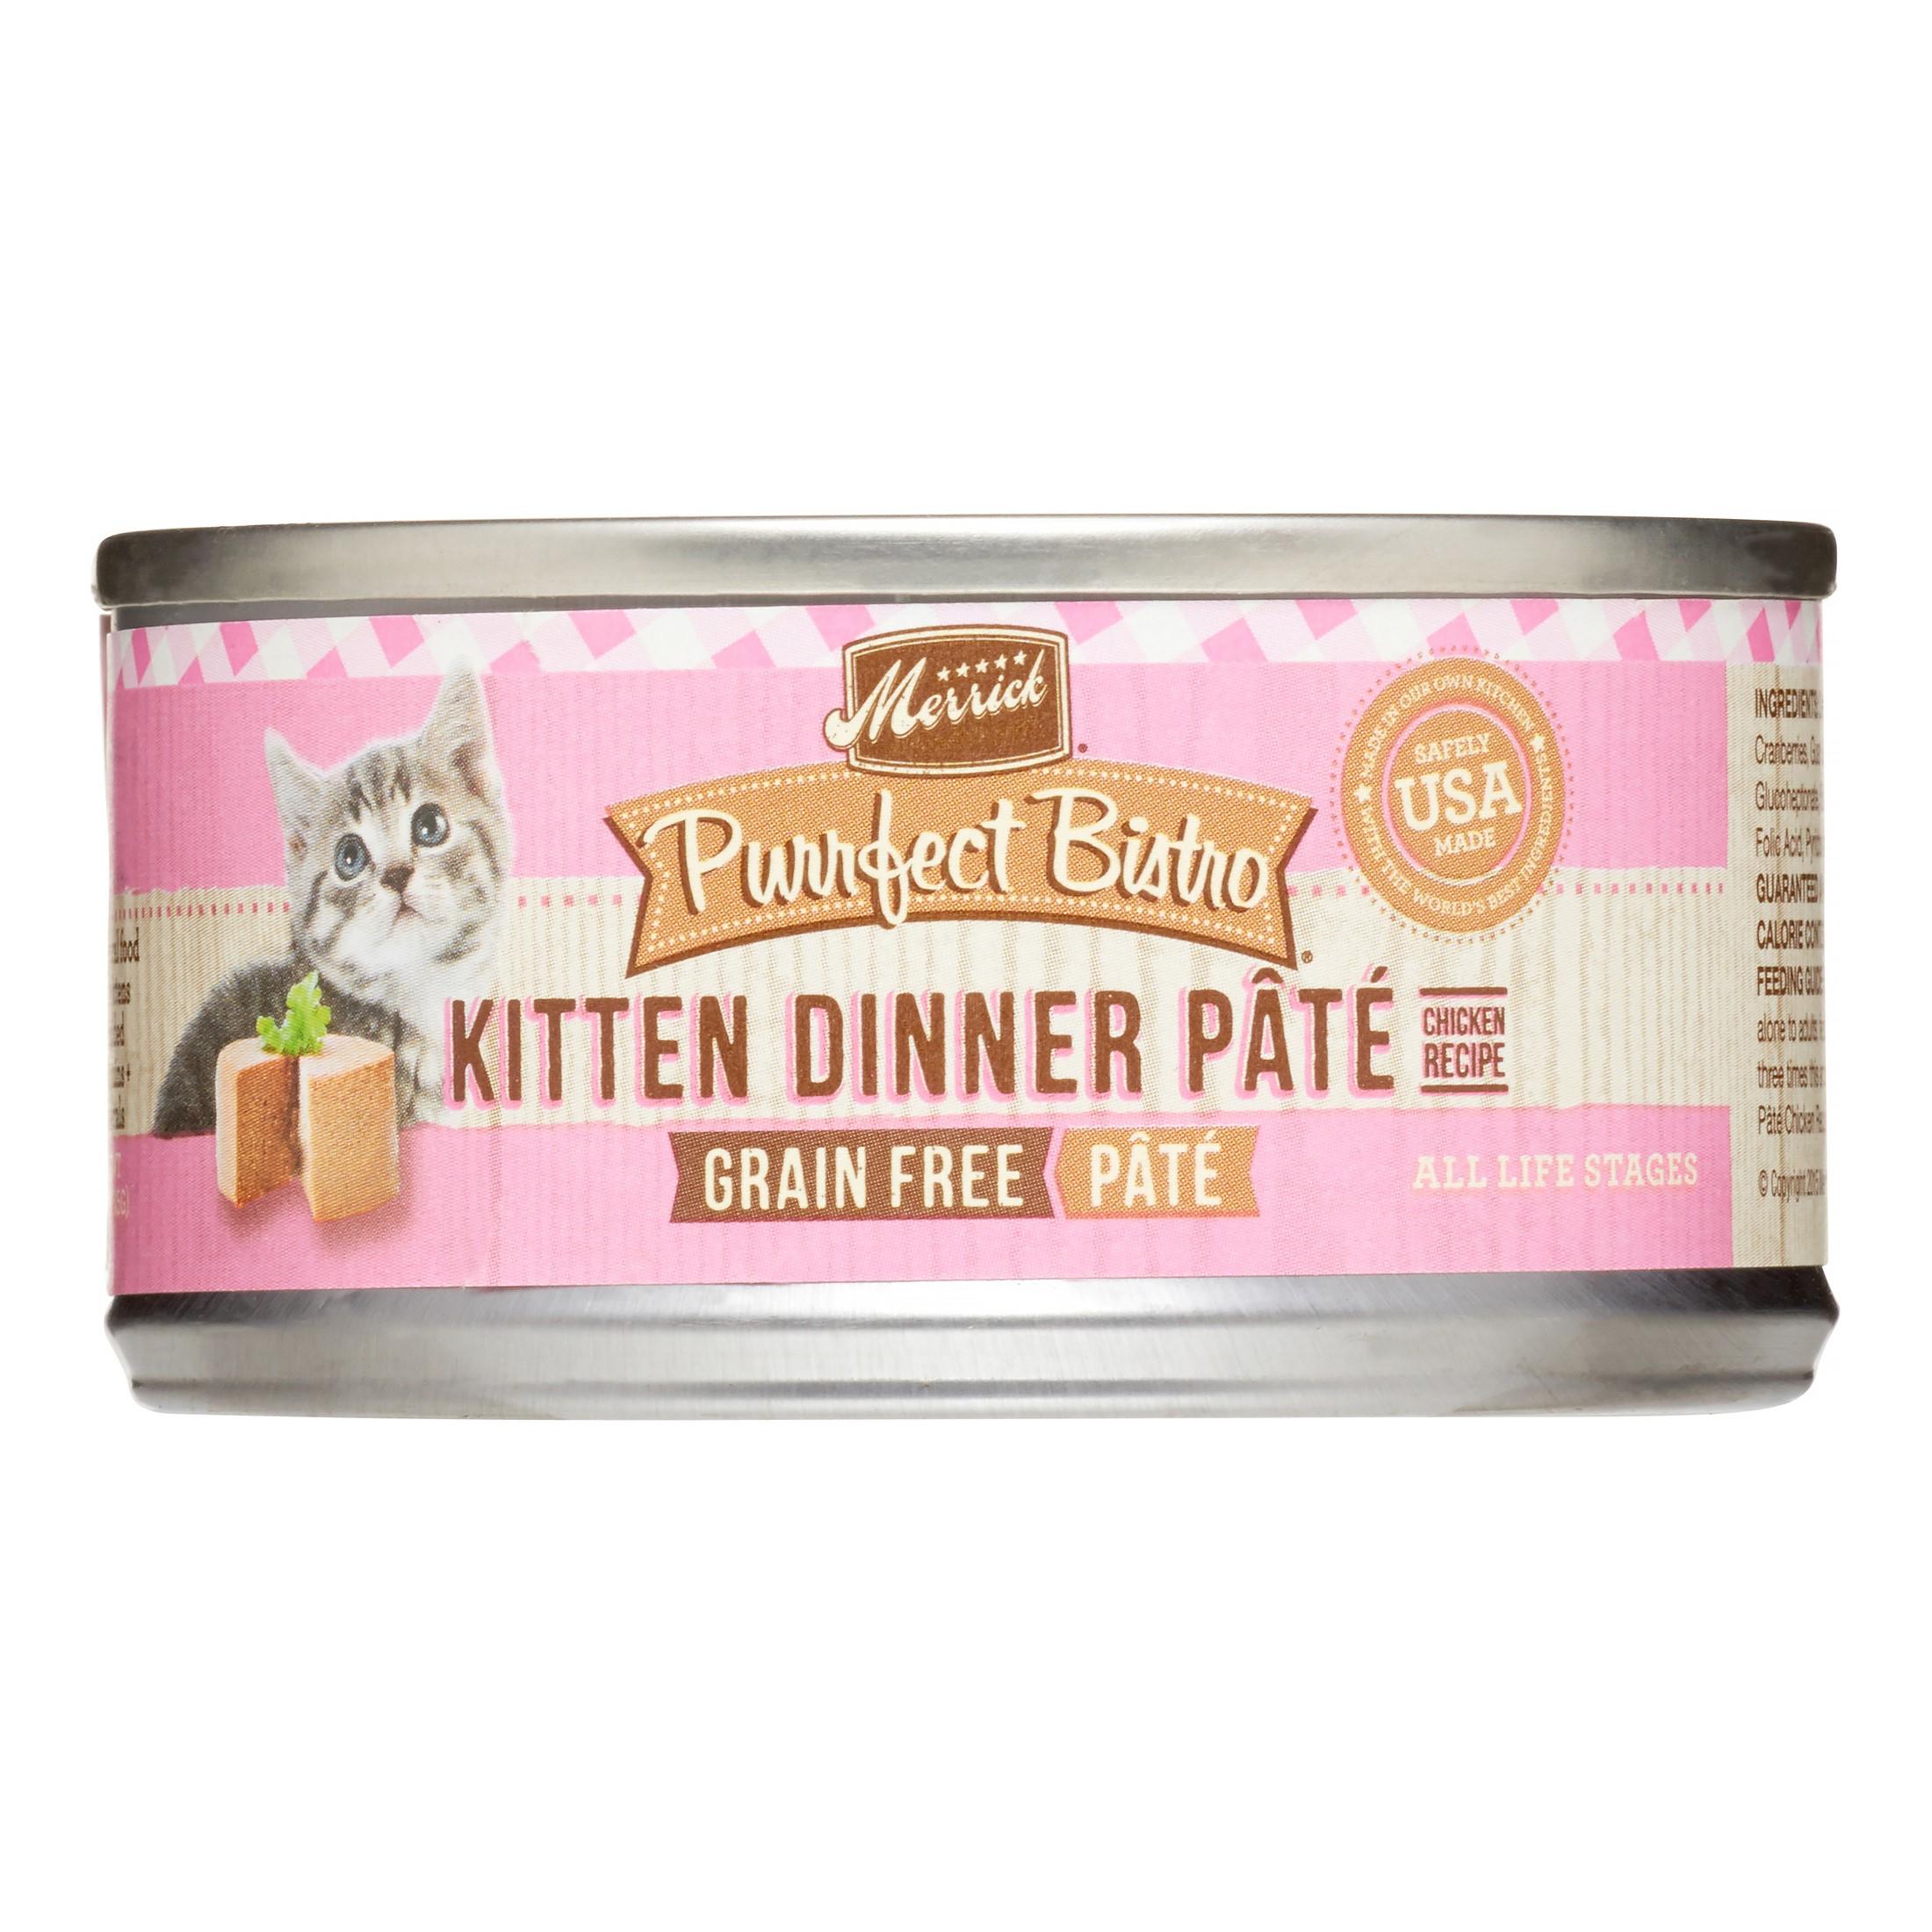 Merrick Purrfect Bistro Grain-Free Kitten Dinner Pate Chicken Recipe Wet Cat Food, 3 oz